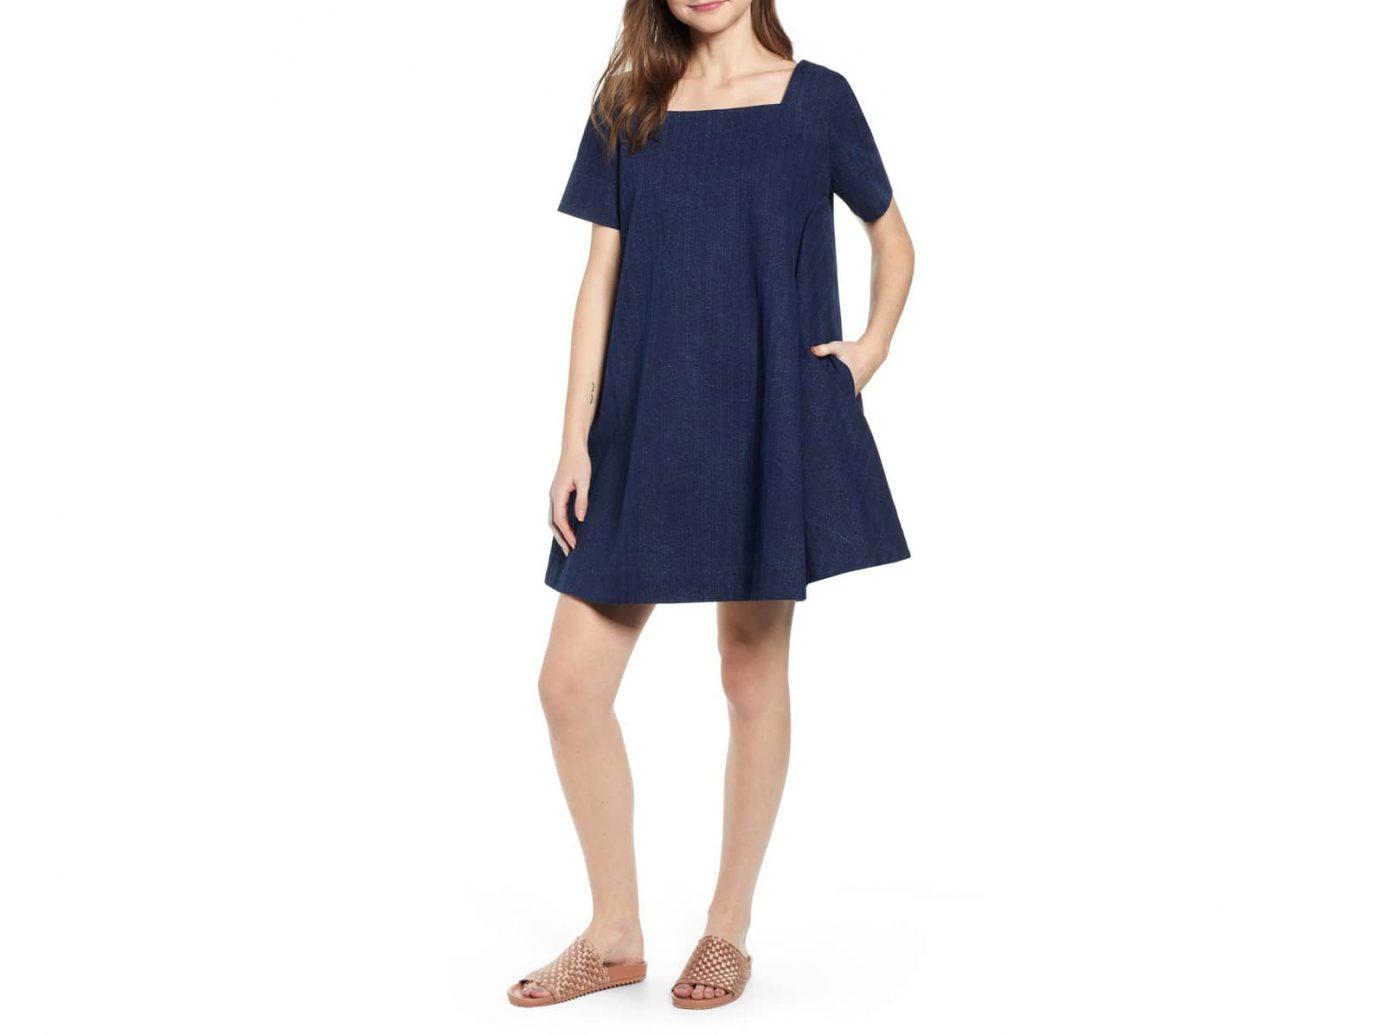 THE ODELLS Damsel x THE ODELLS Bella Square Neck Cotton Swing Dress